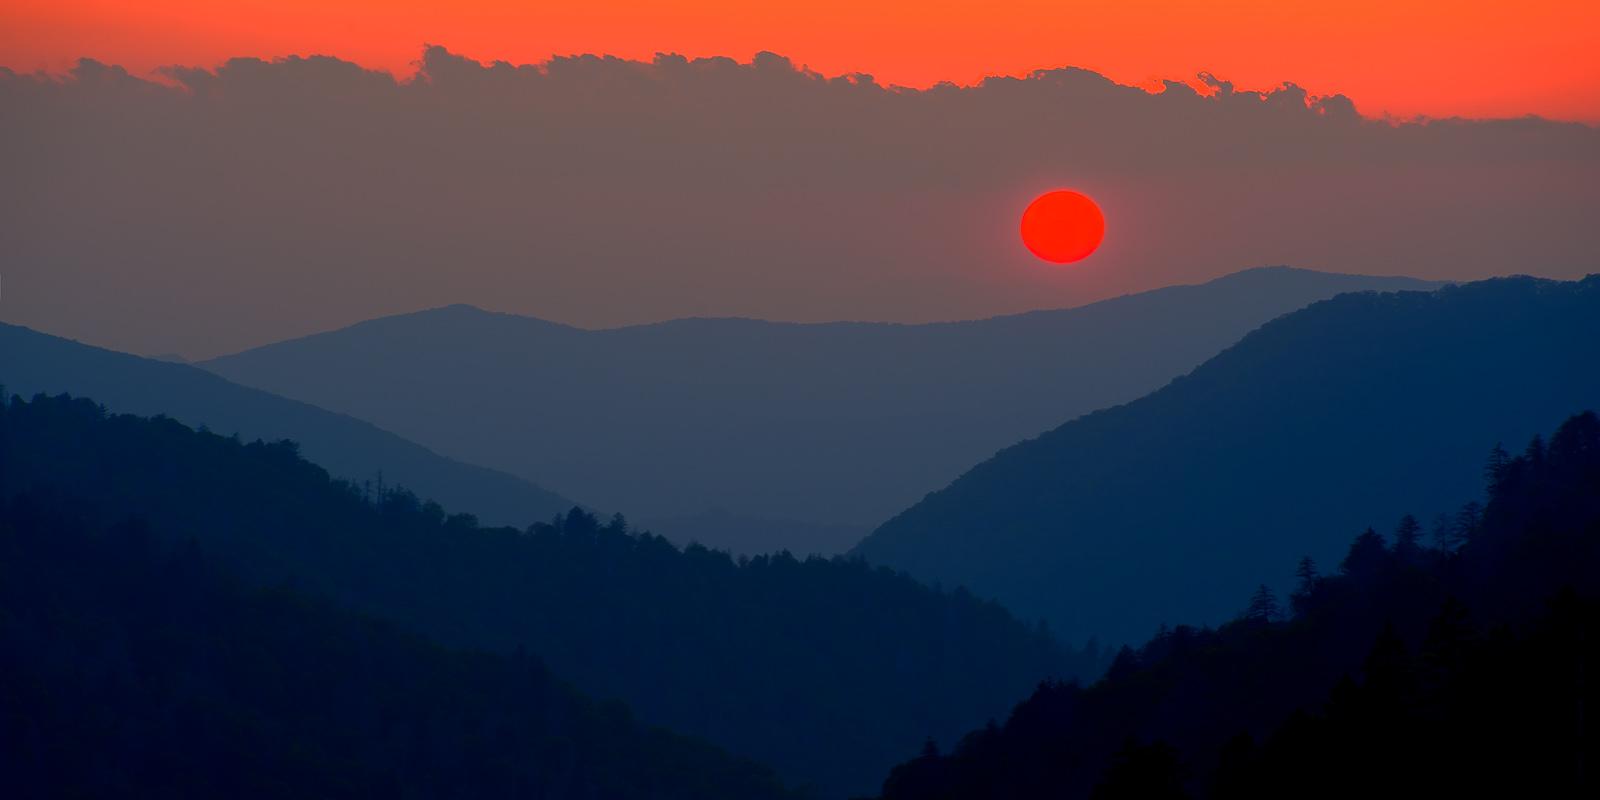 1smoky-mountain-sunset